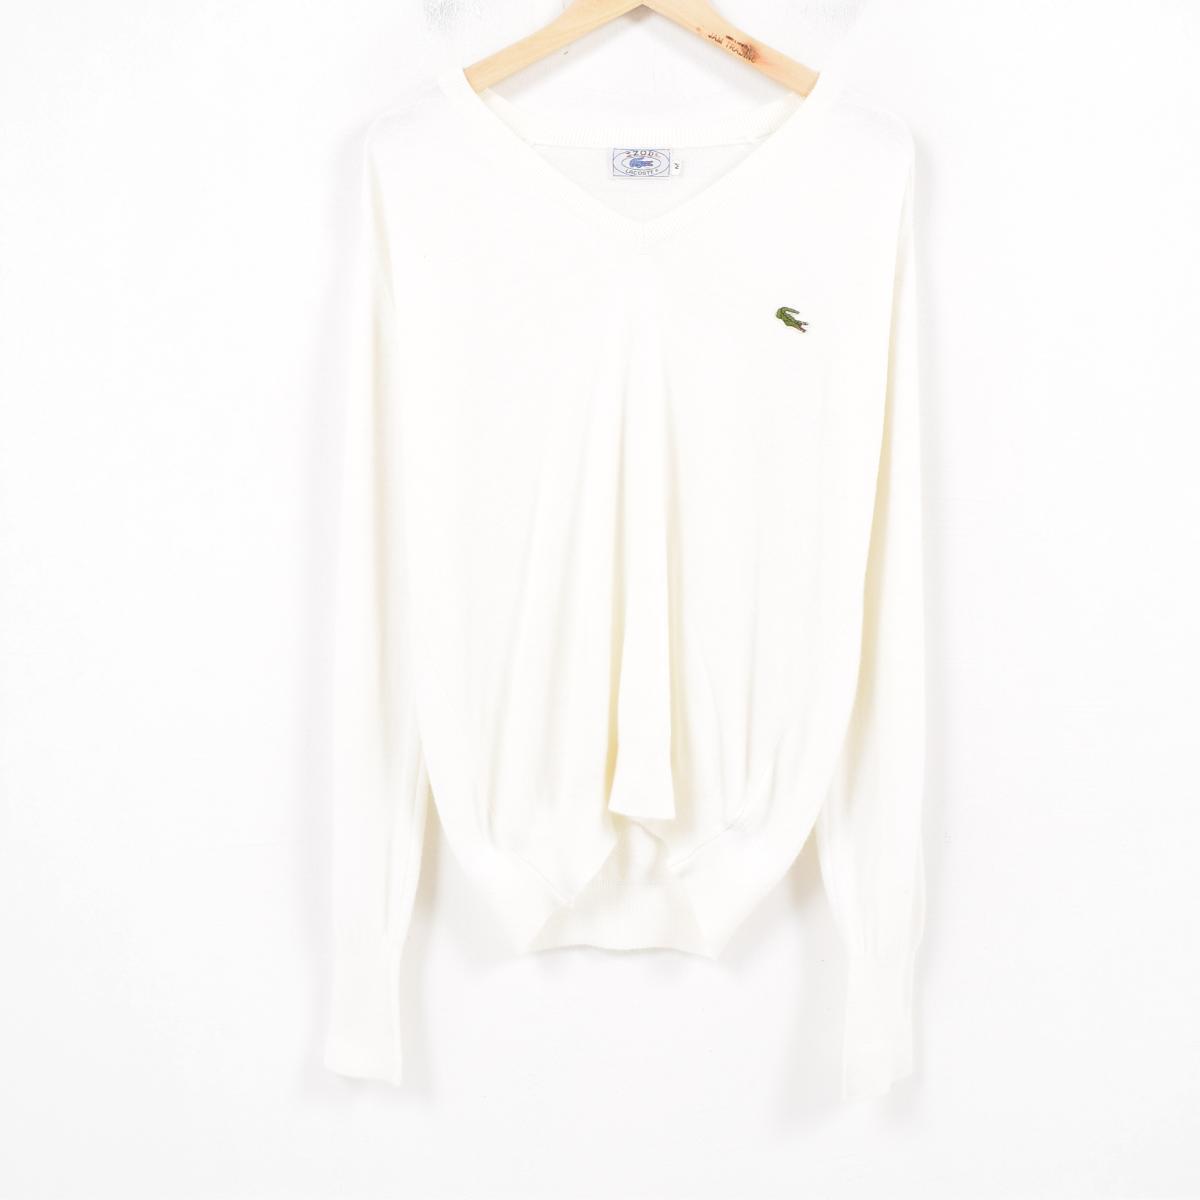 856432fa2502ec 70-80 generation Lacoste LACOSTE IZOD acrylic knit sweater men M vintage   was0802